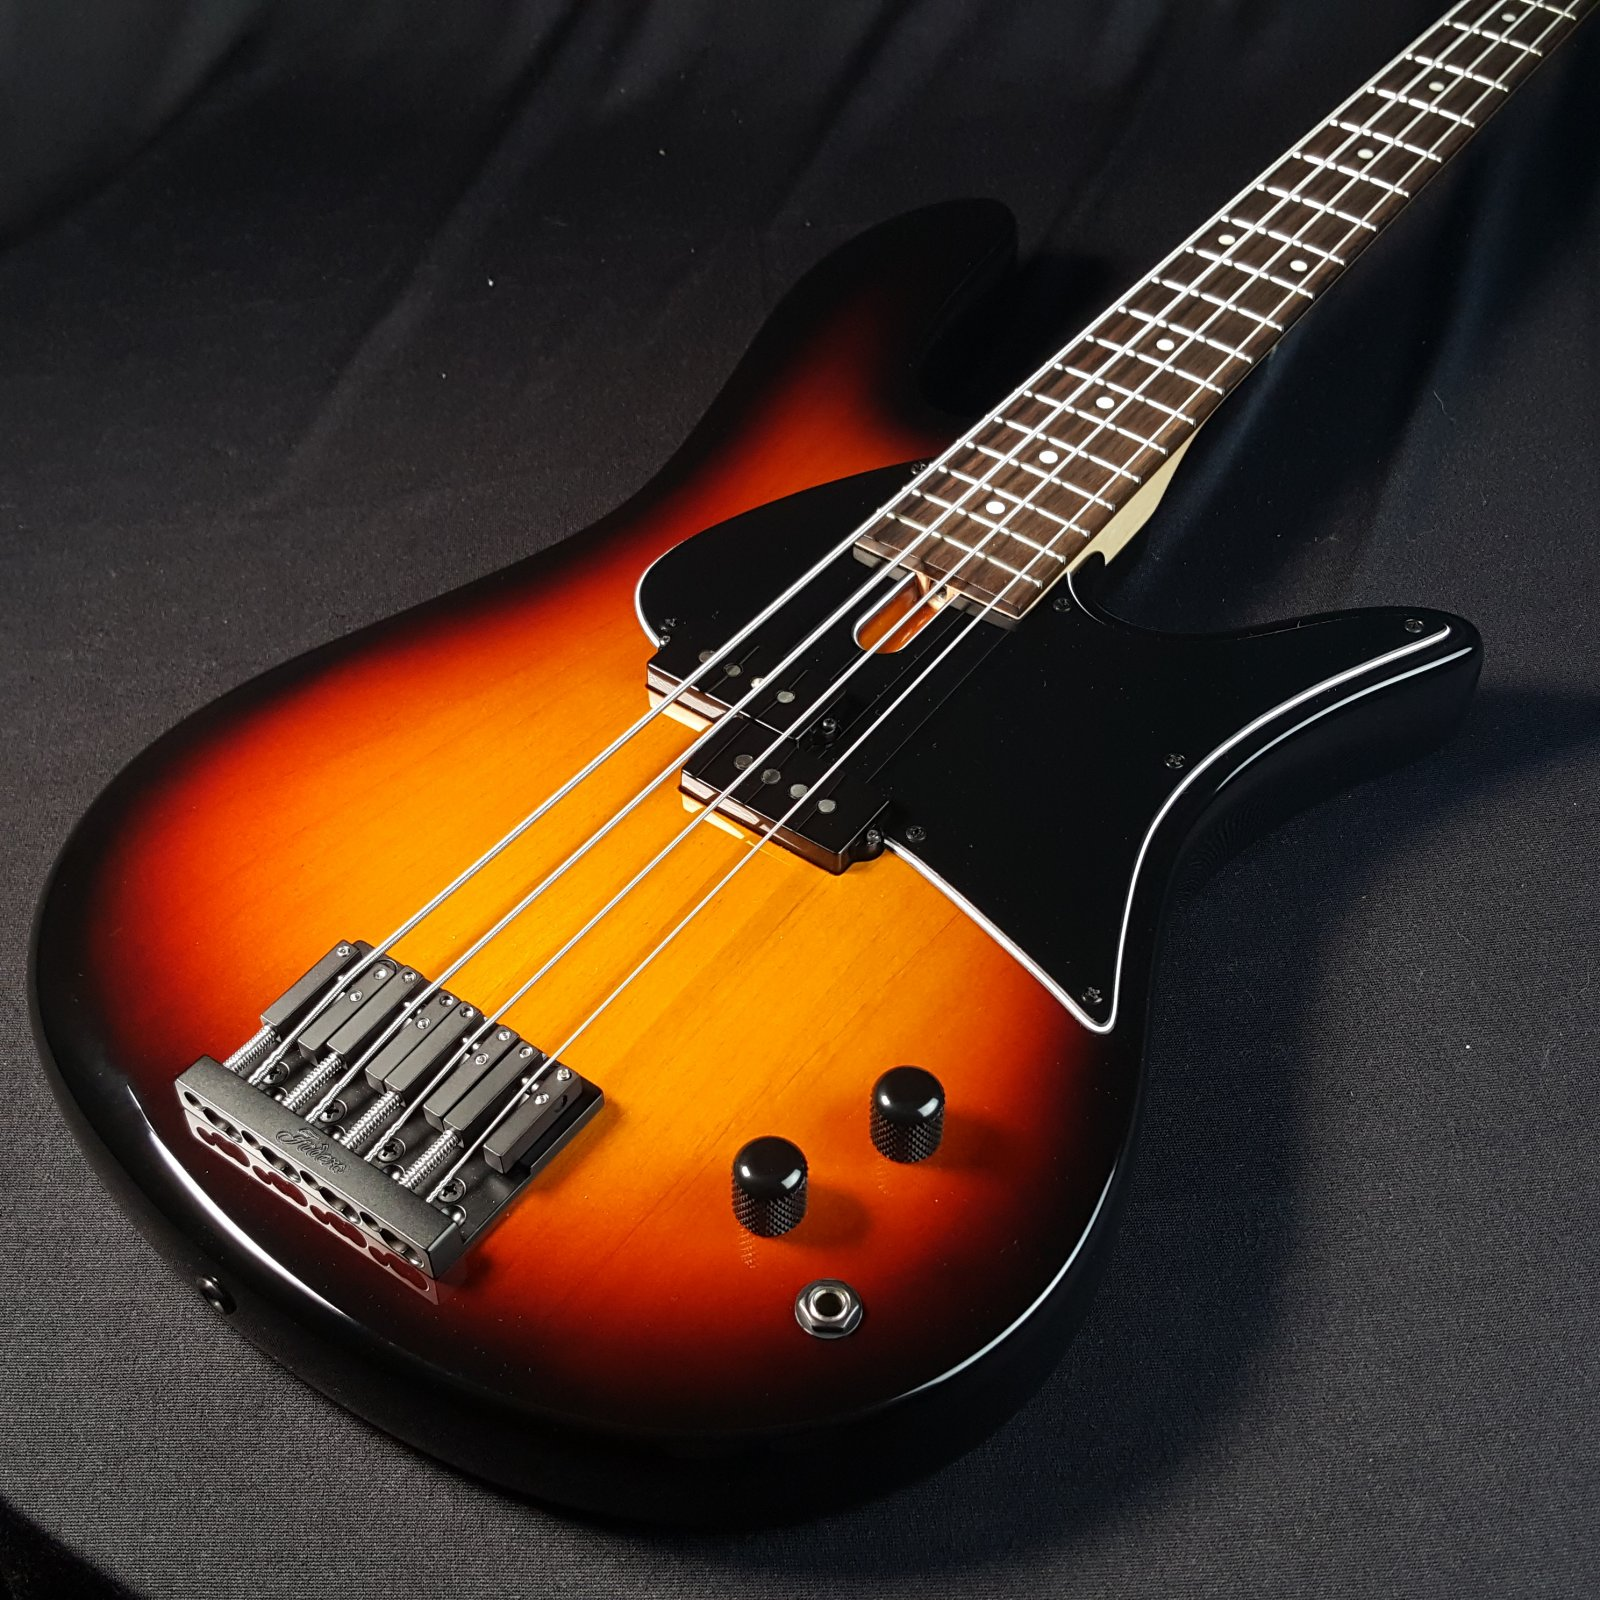 Used 2017 Fodera Monarch P 4 String Bass w/ Original Case